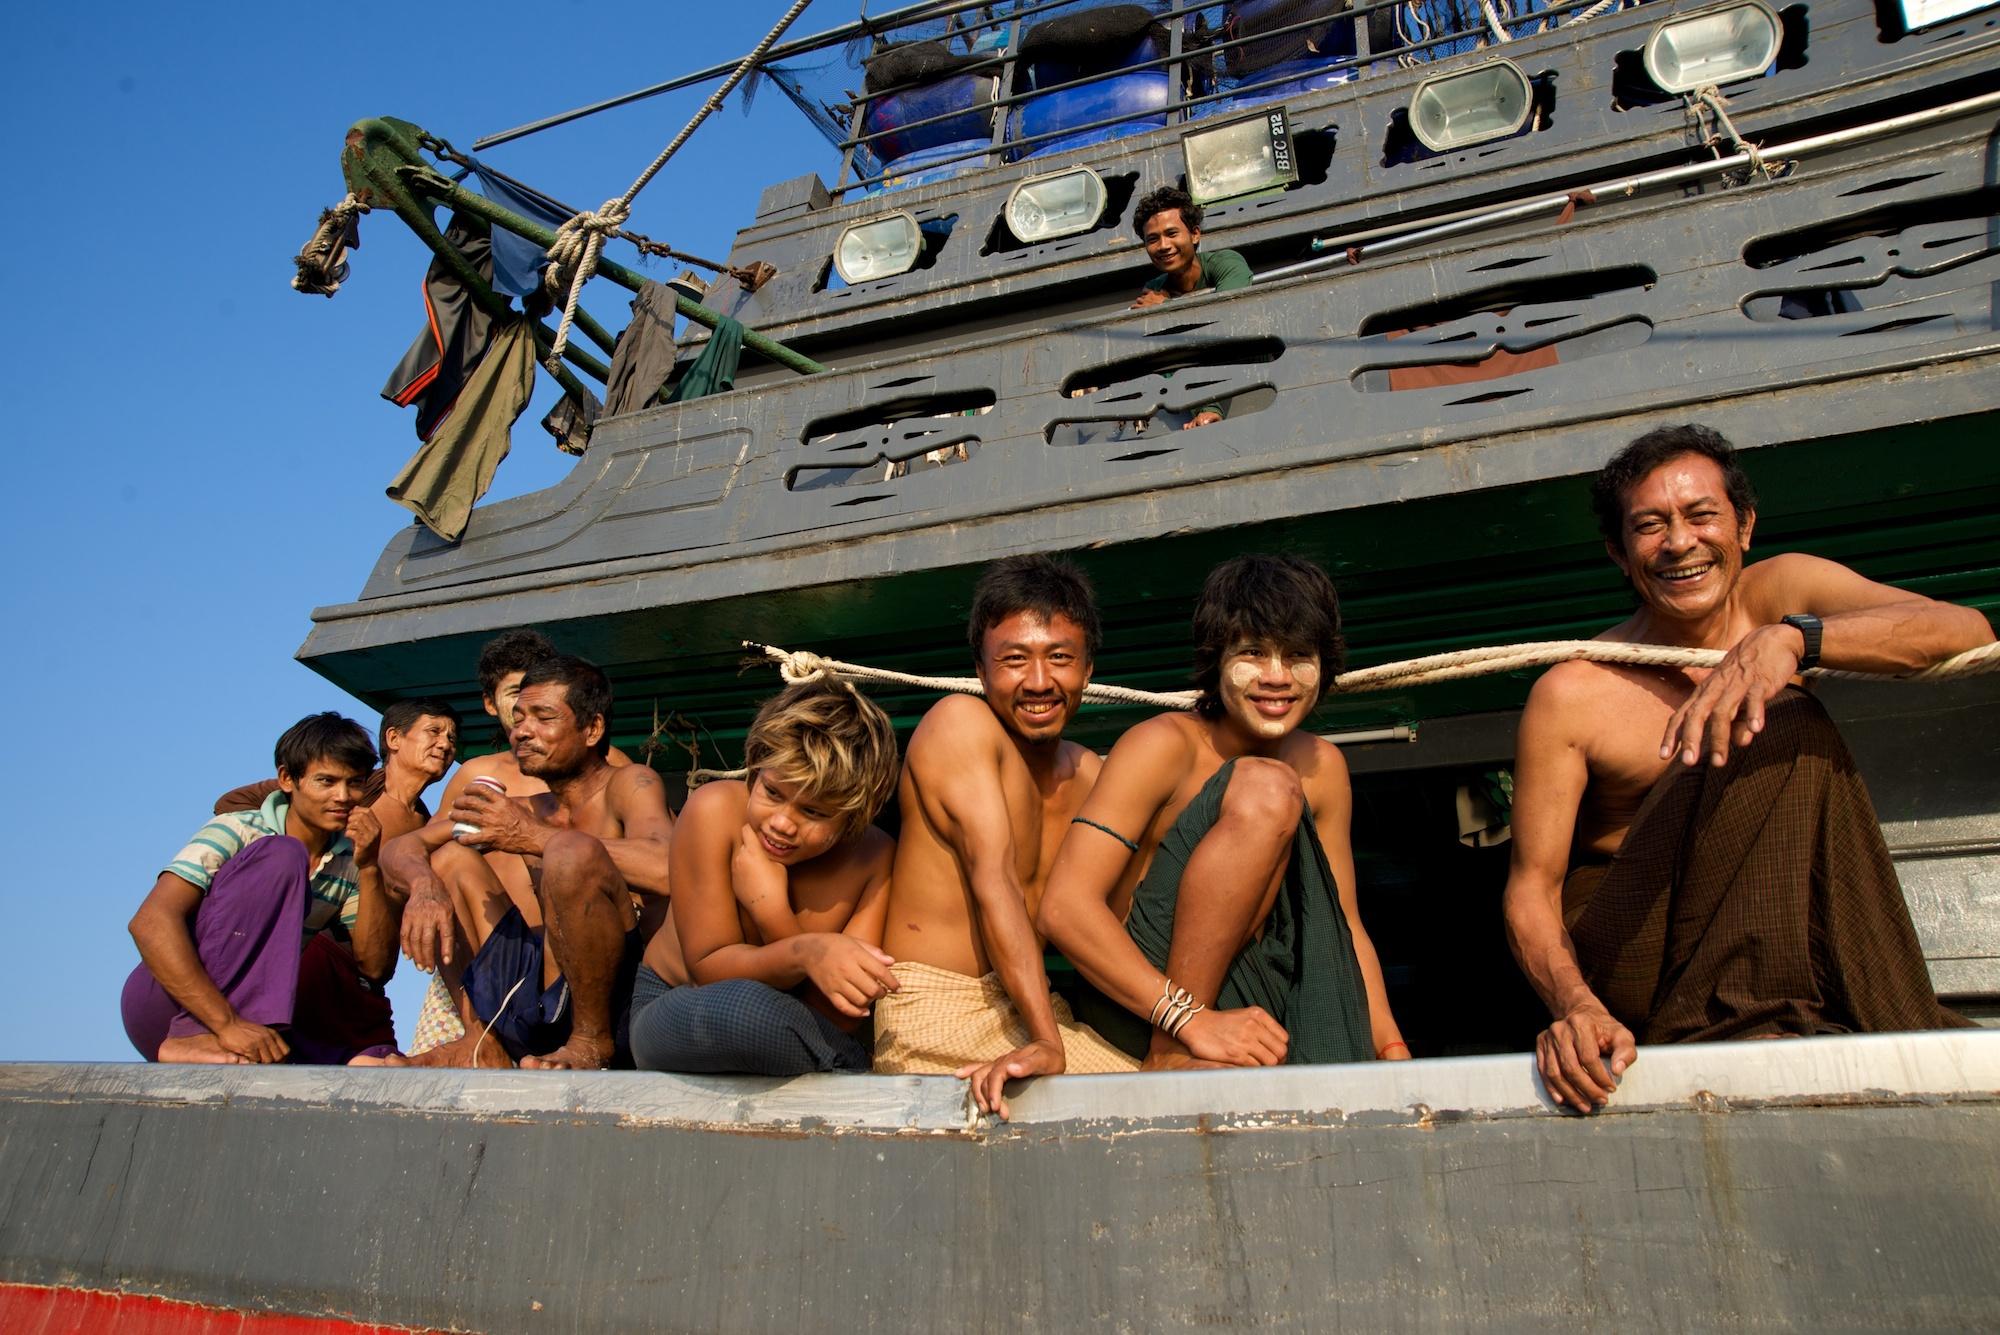 BB_Mergui_FishingBoat.jpg